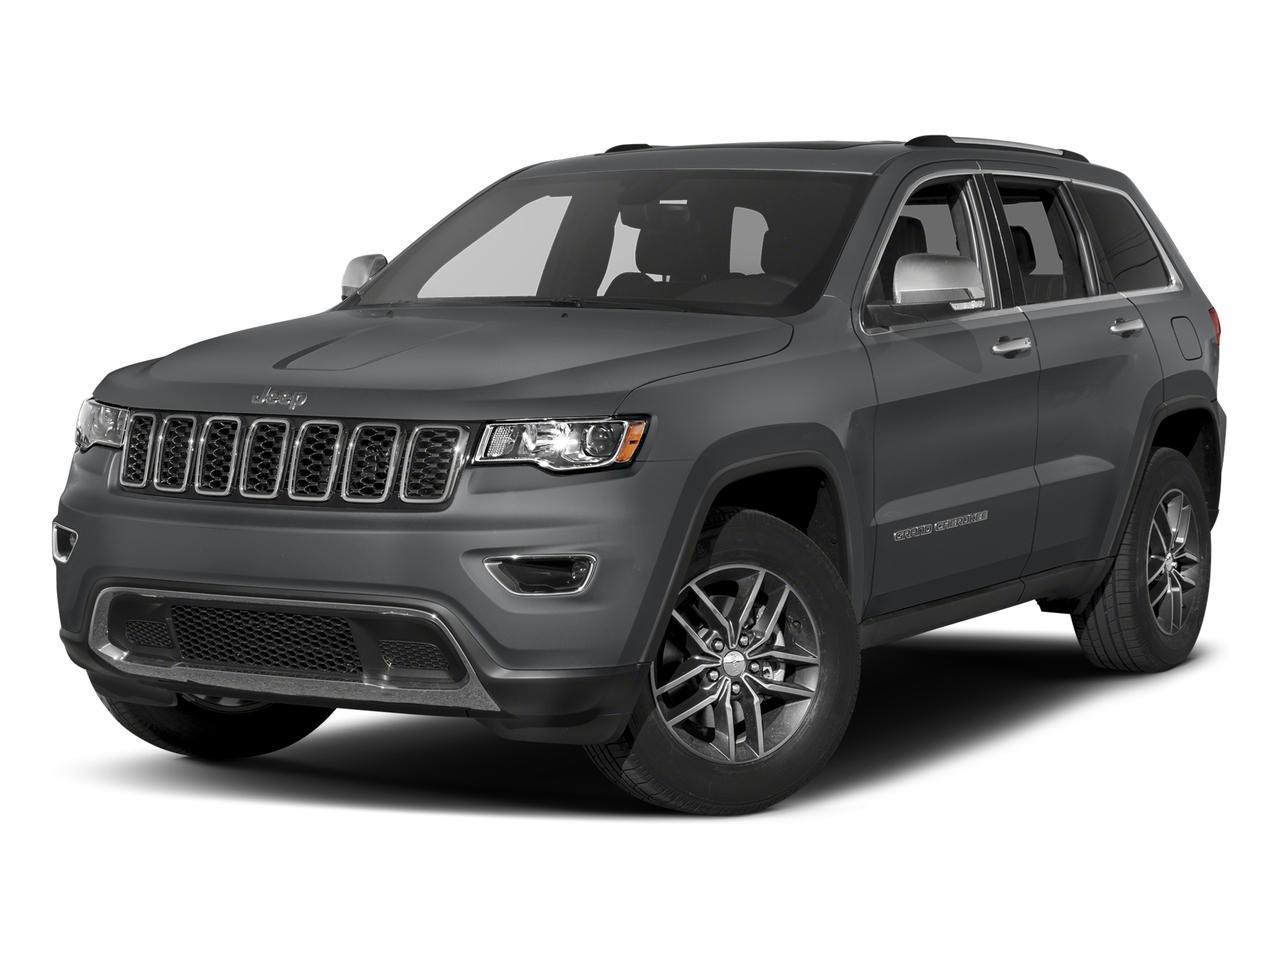 2017 Jeep Grand Cherokee Vehicle Photo in King George, VA 22485